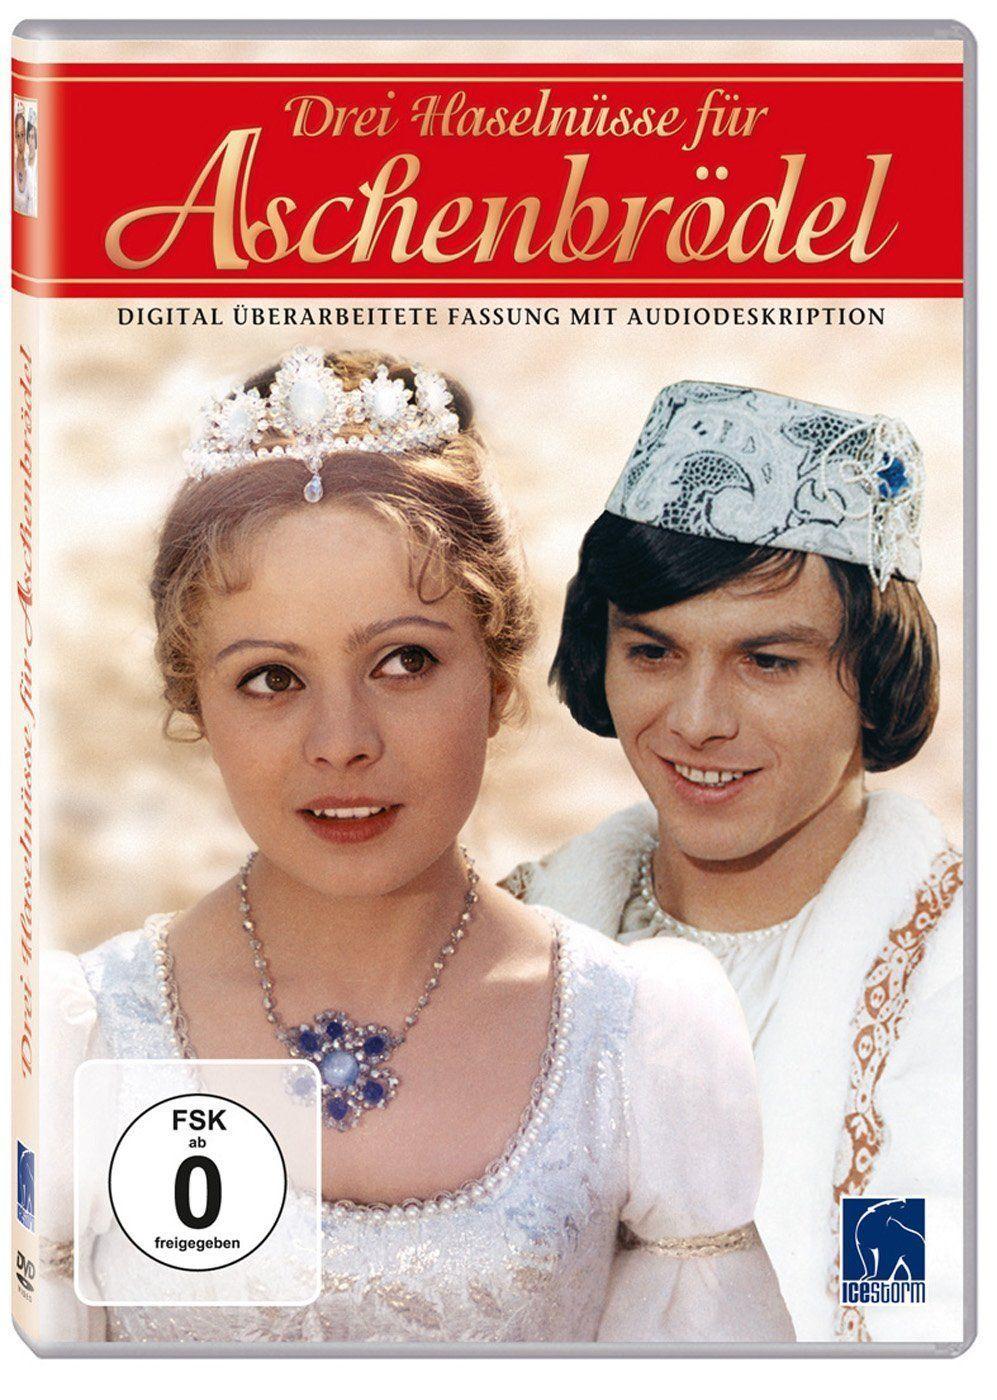 Romantische Filme #film #movie #women #romance #romantik #news ...